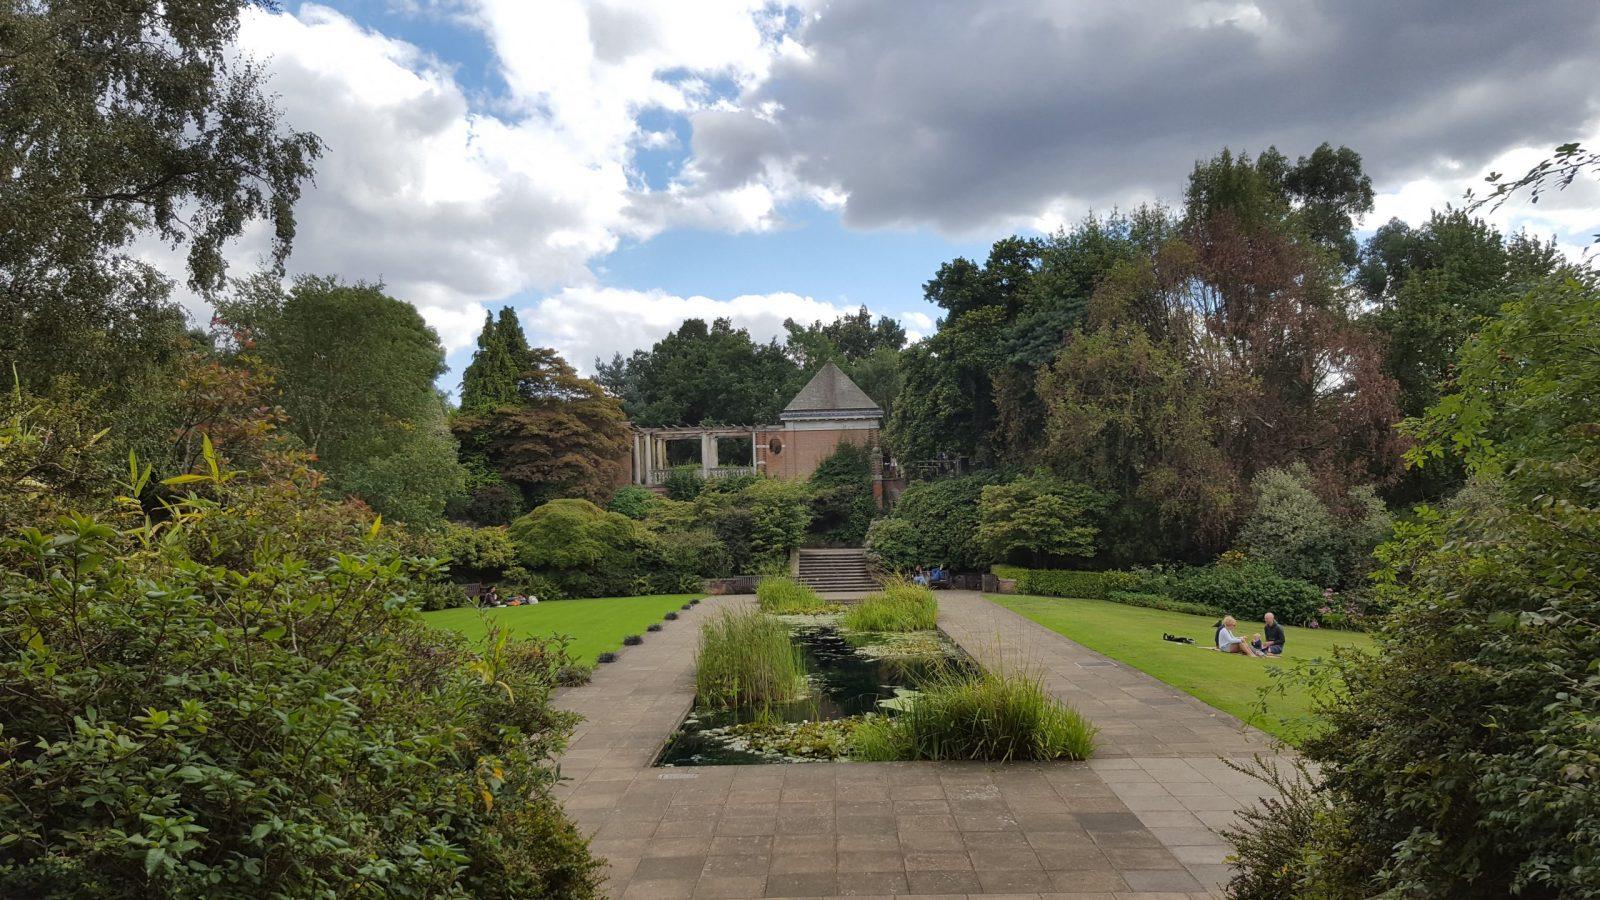 Visiting Hill Garden & Pergola, Hampstead Heath: Photo Gallery 16